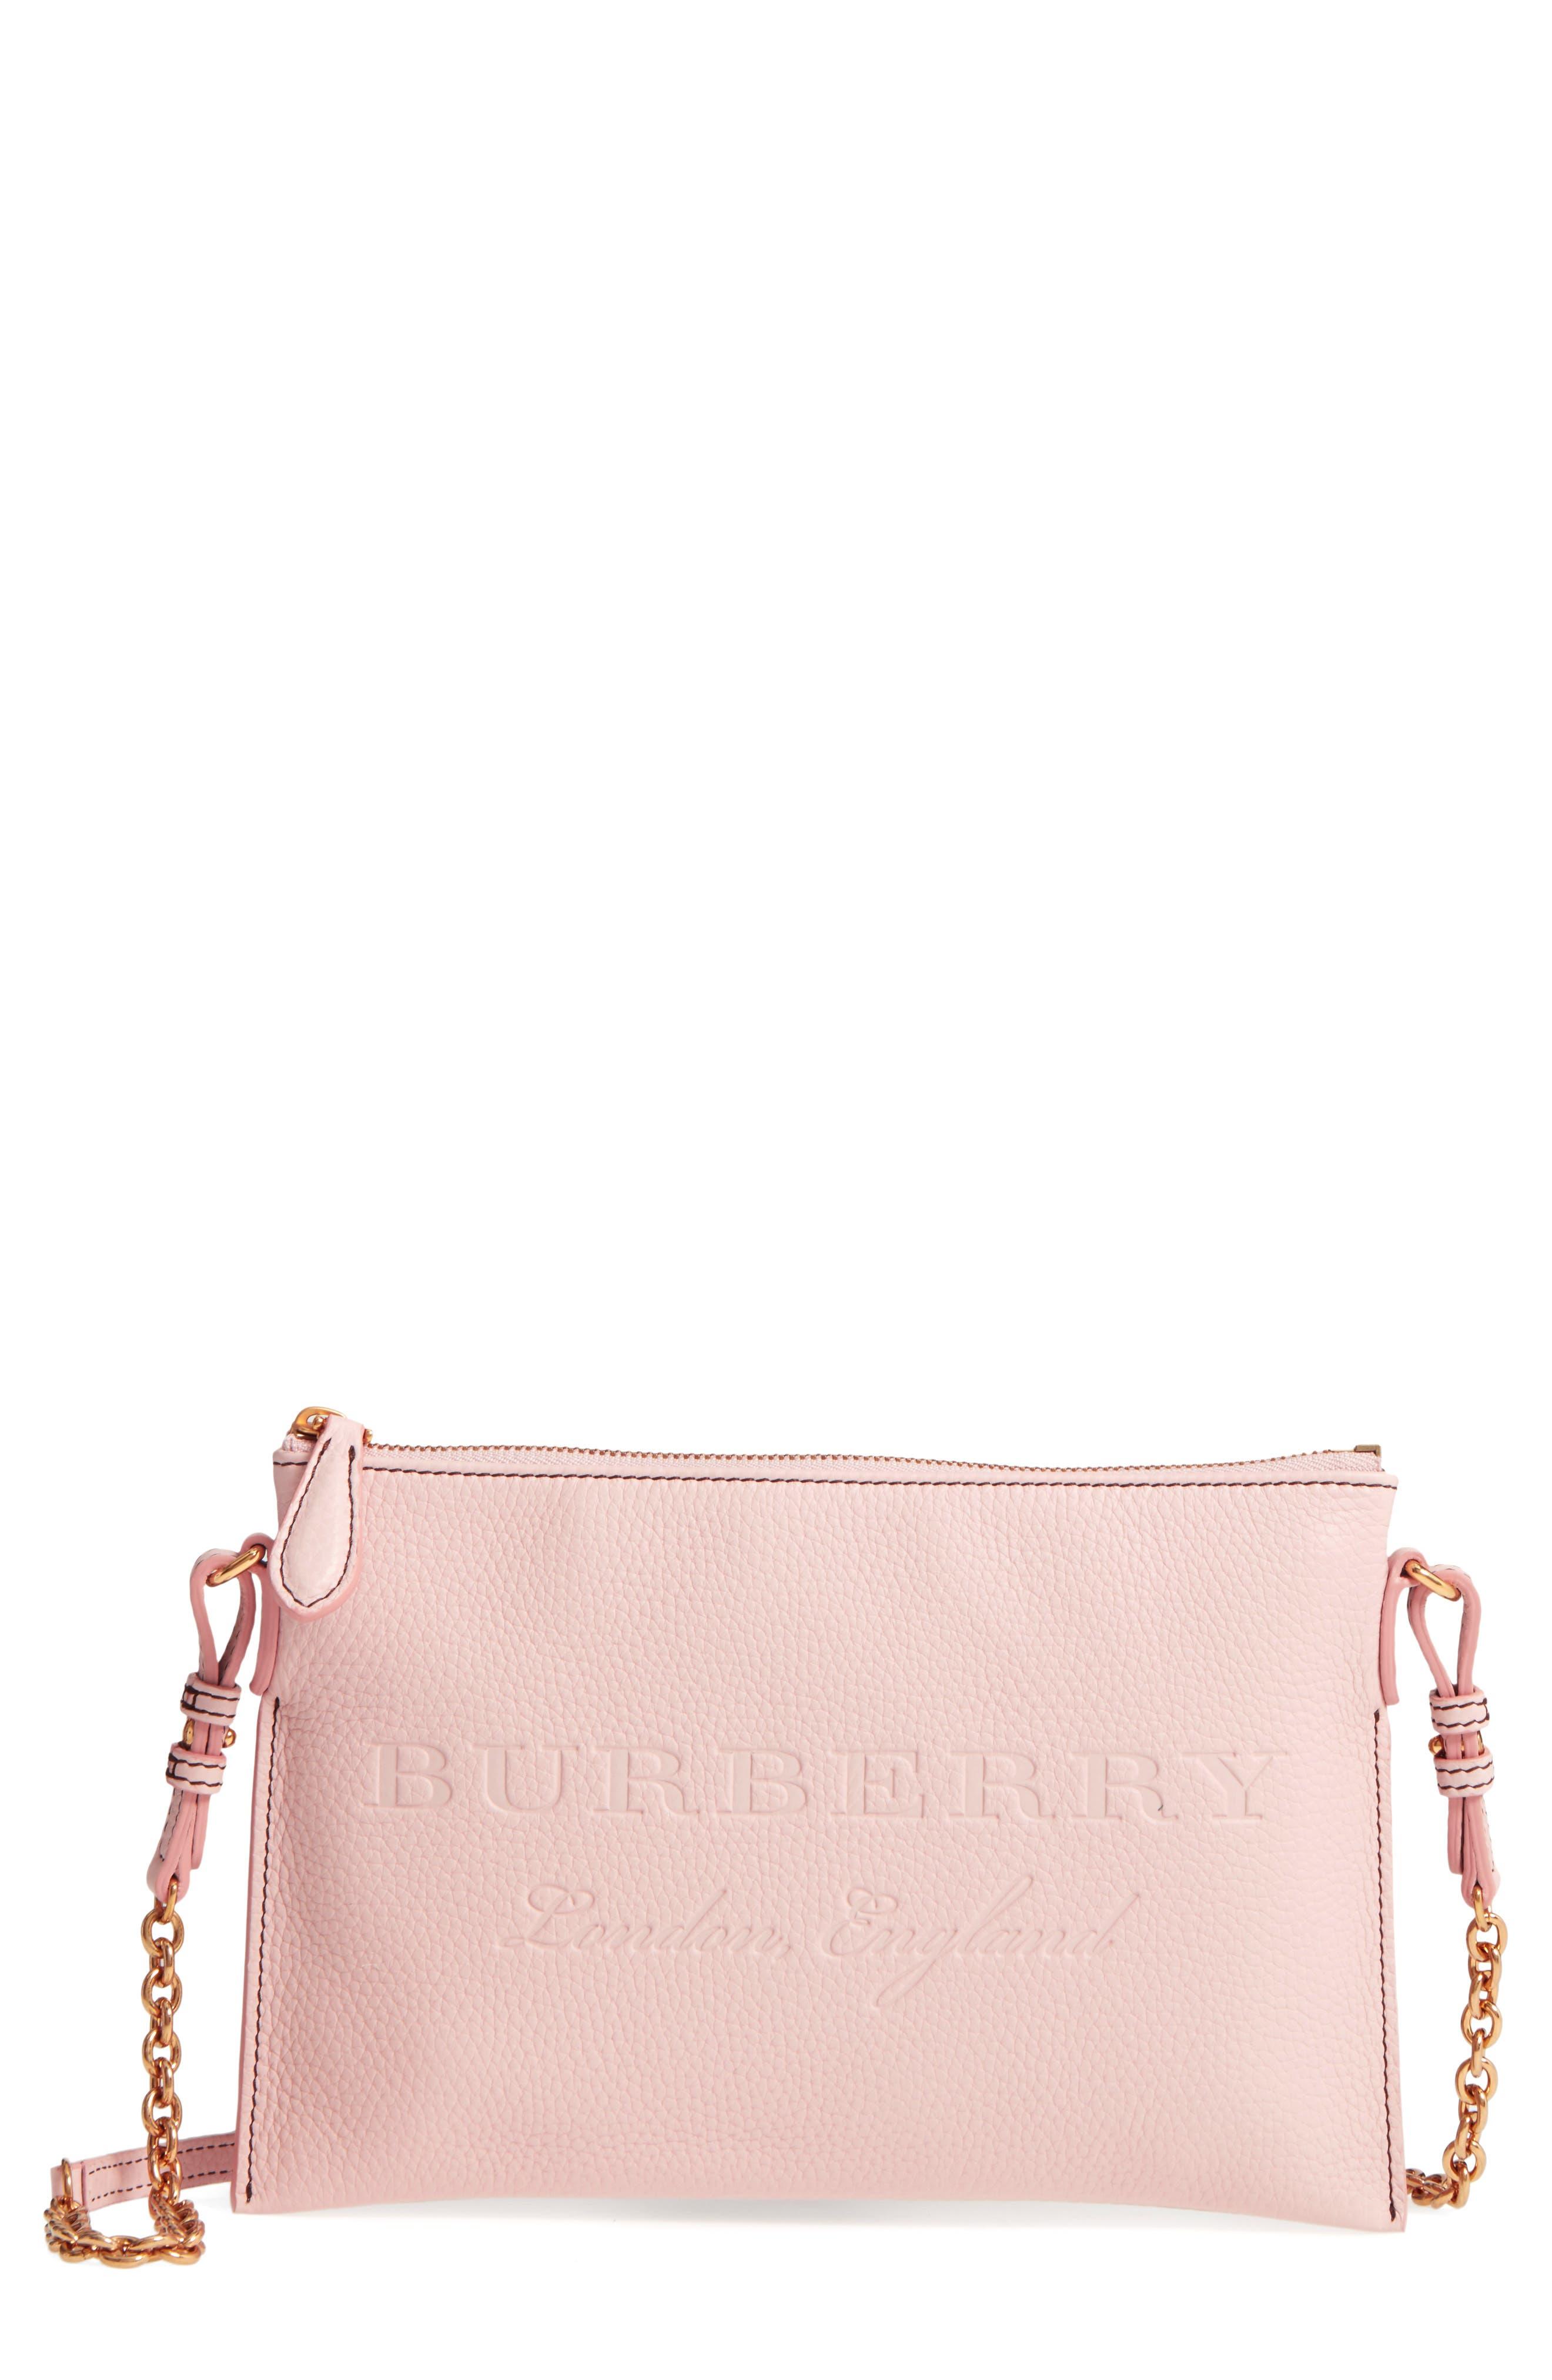 Burberry Peyton Logo Crossbody Bag